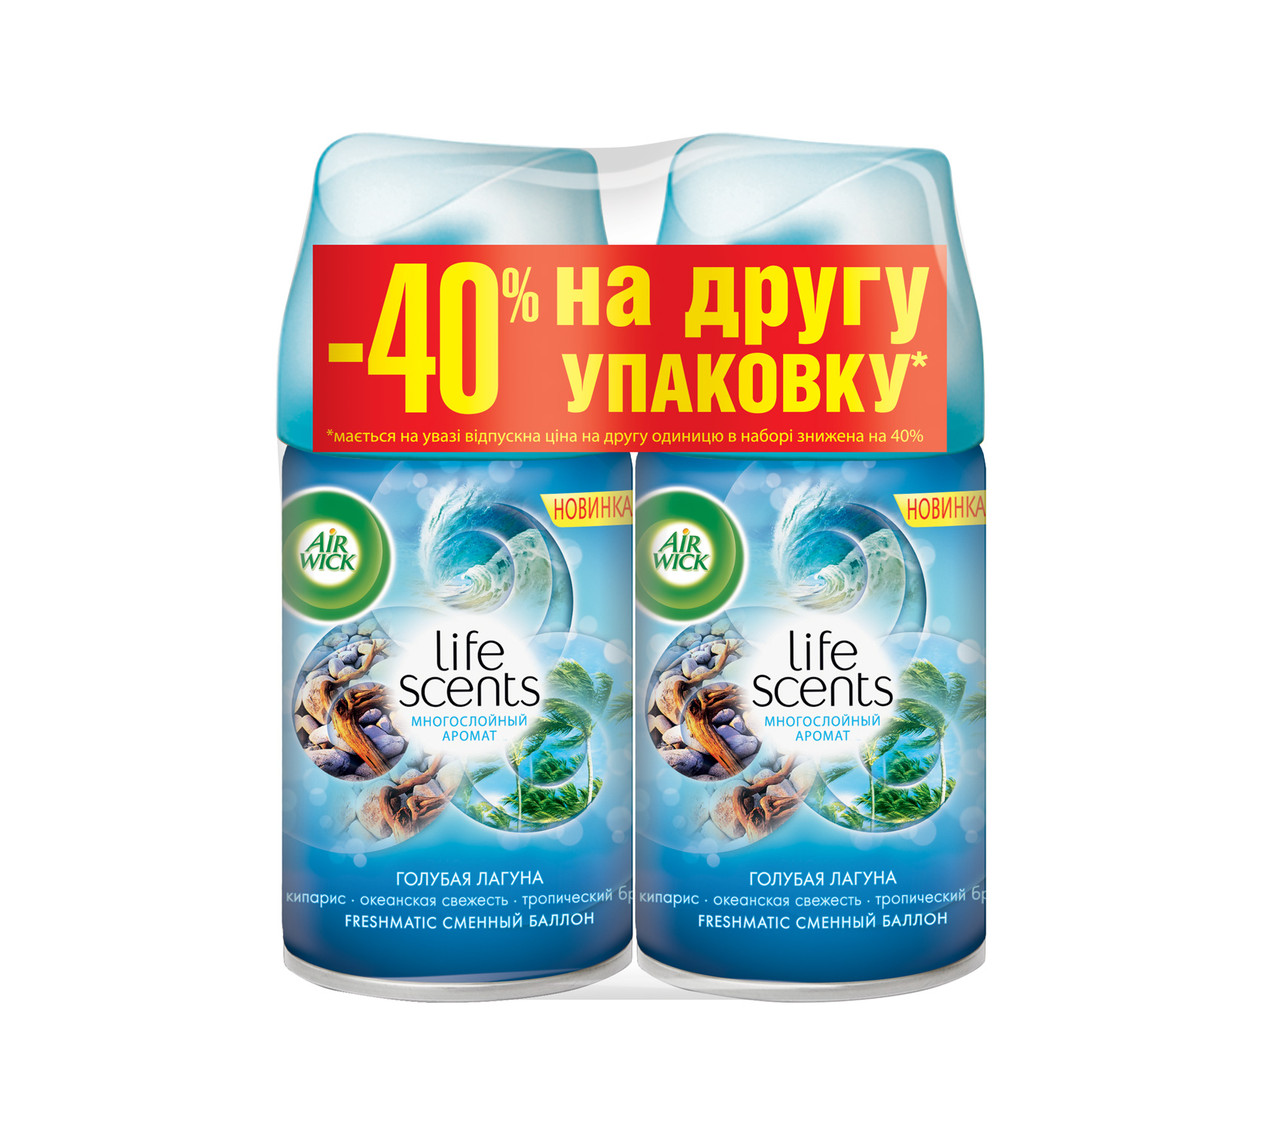 DUO PACK ARW FMAT REFIL Блакитна  Лагуна (-40% on 2nd)